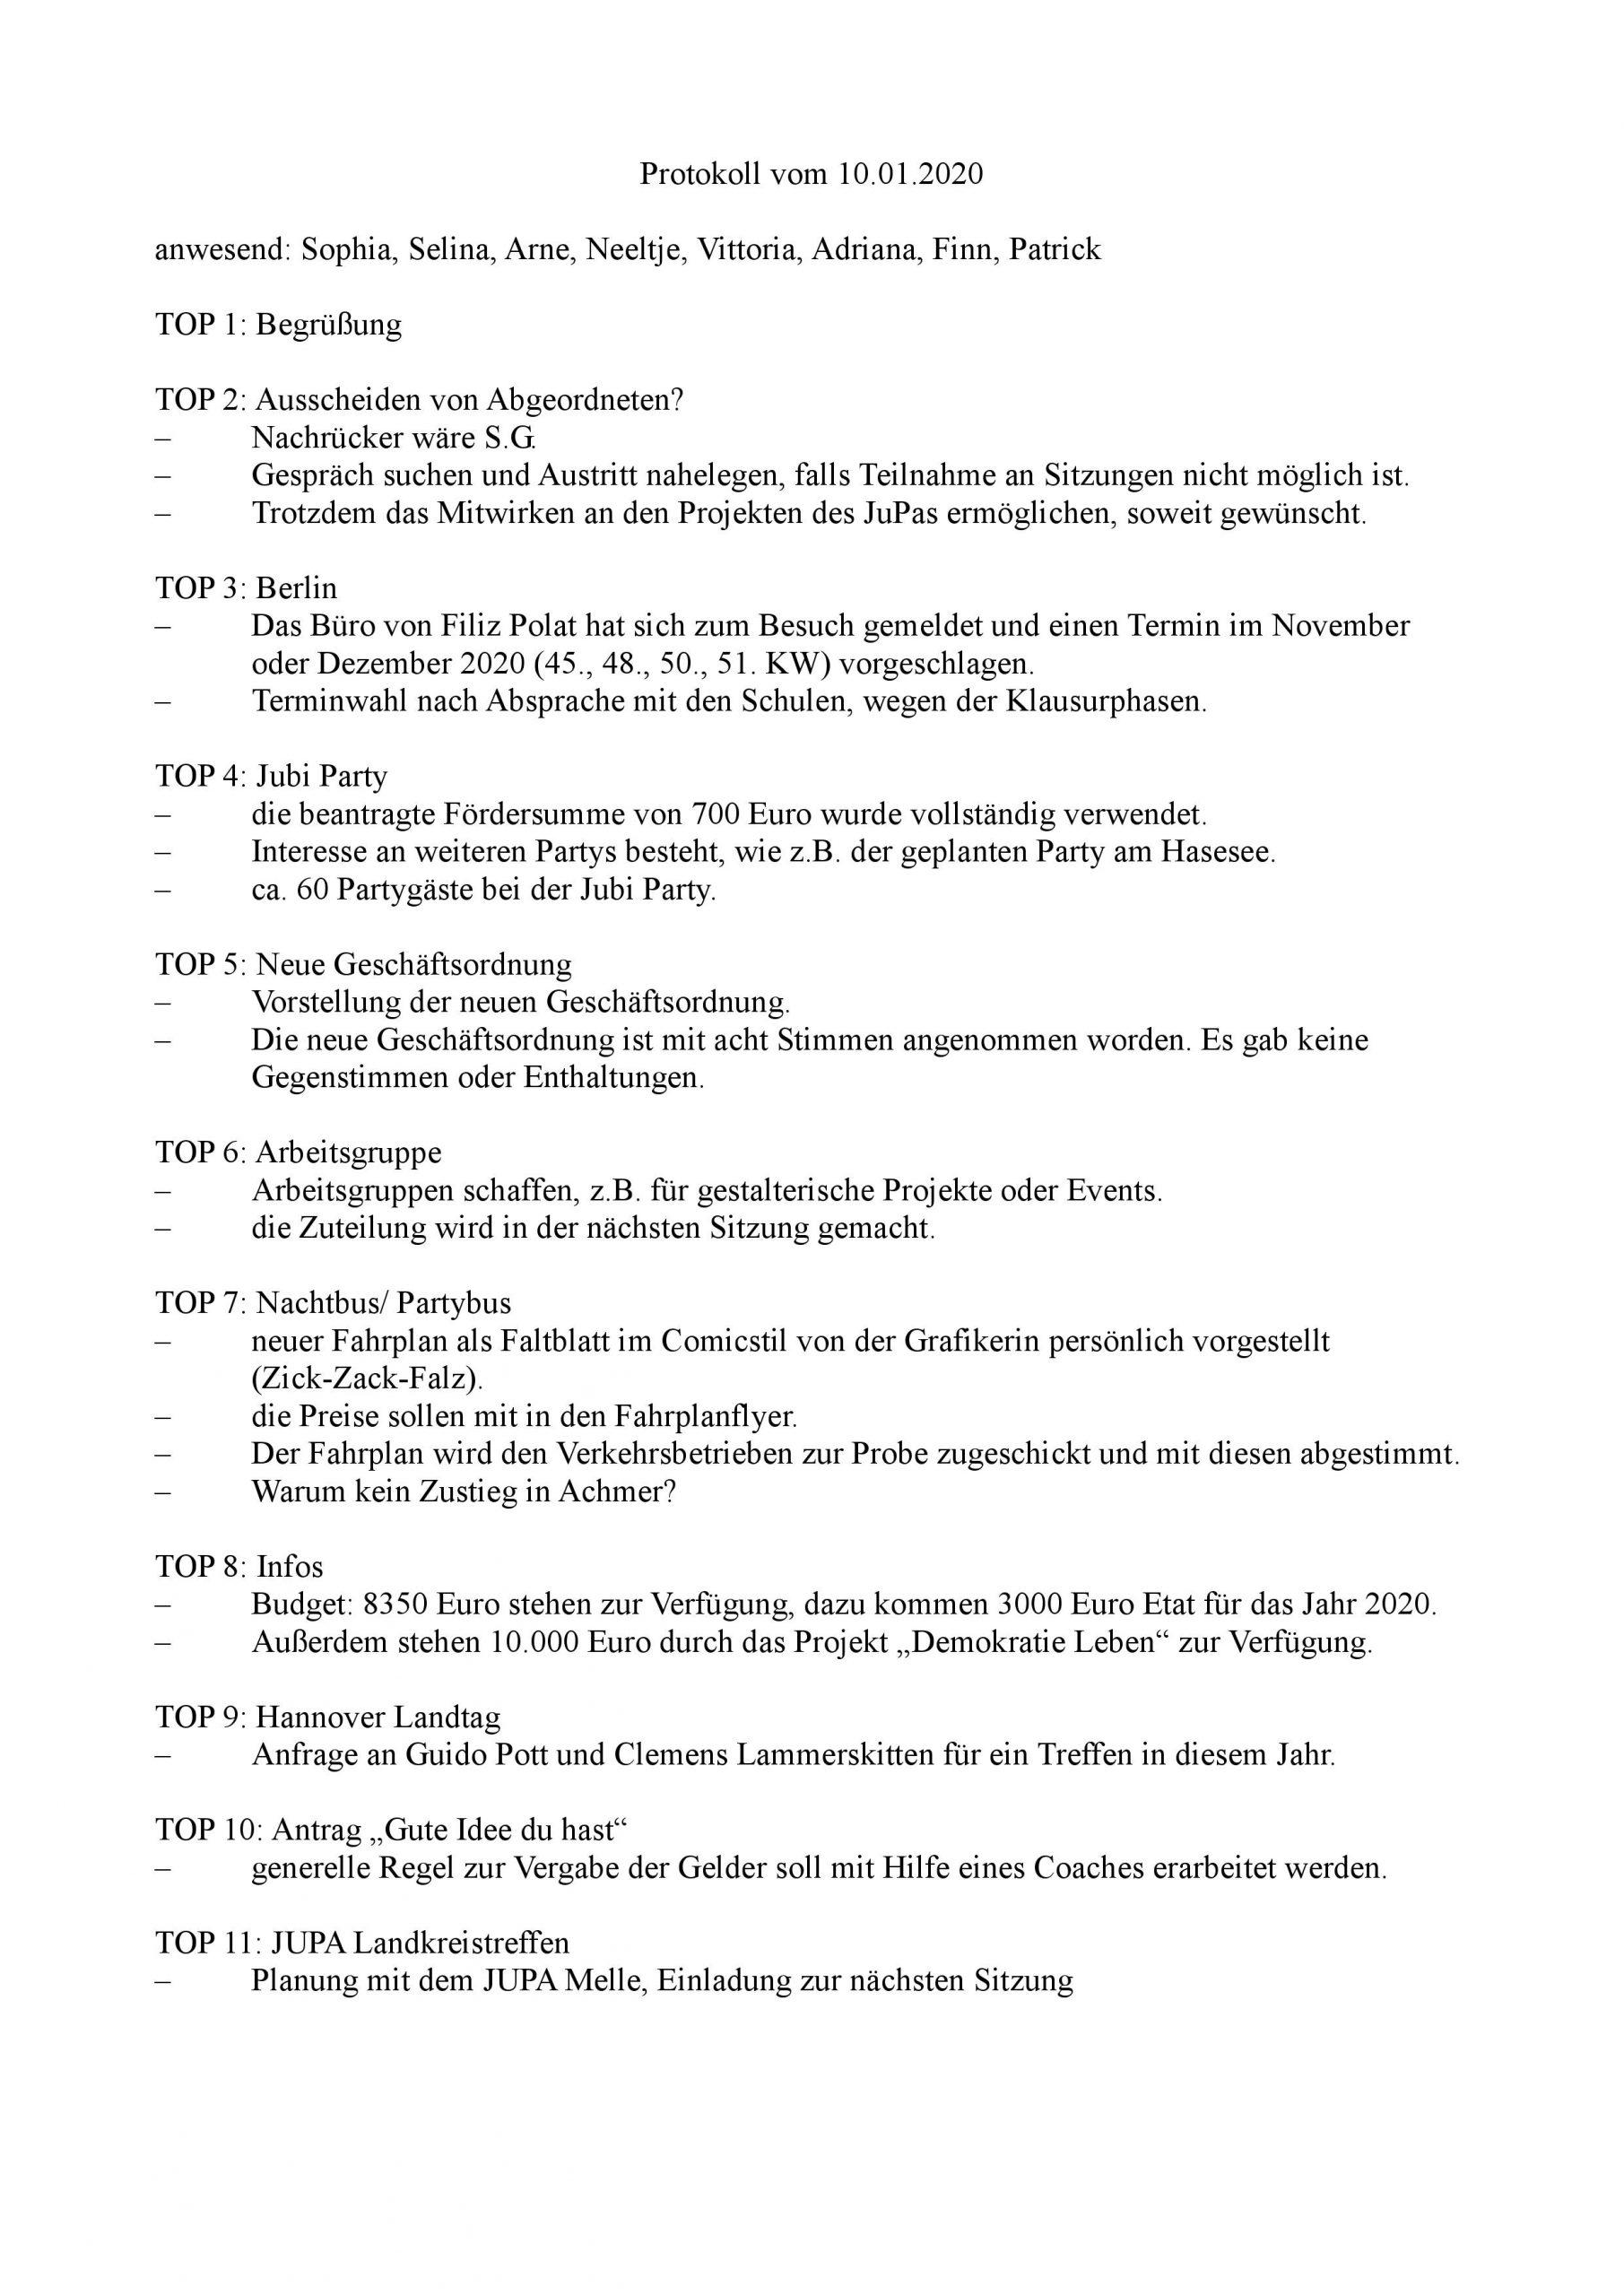 Protokoll Jupa Bramsche